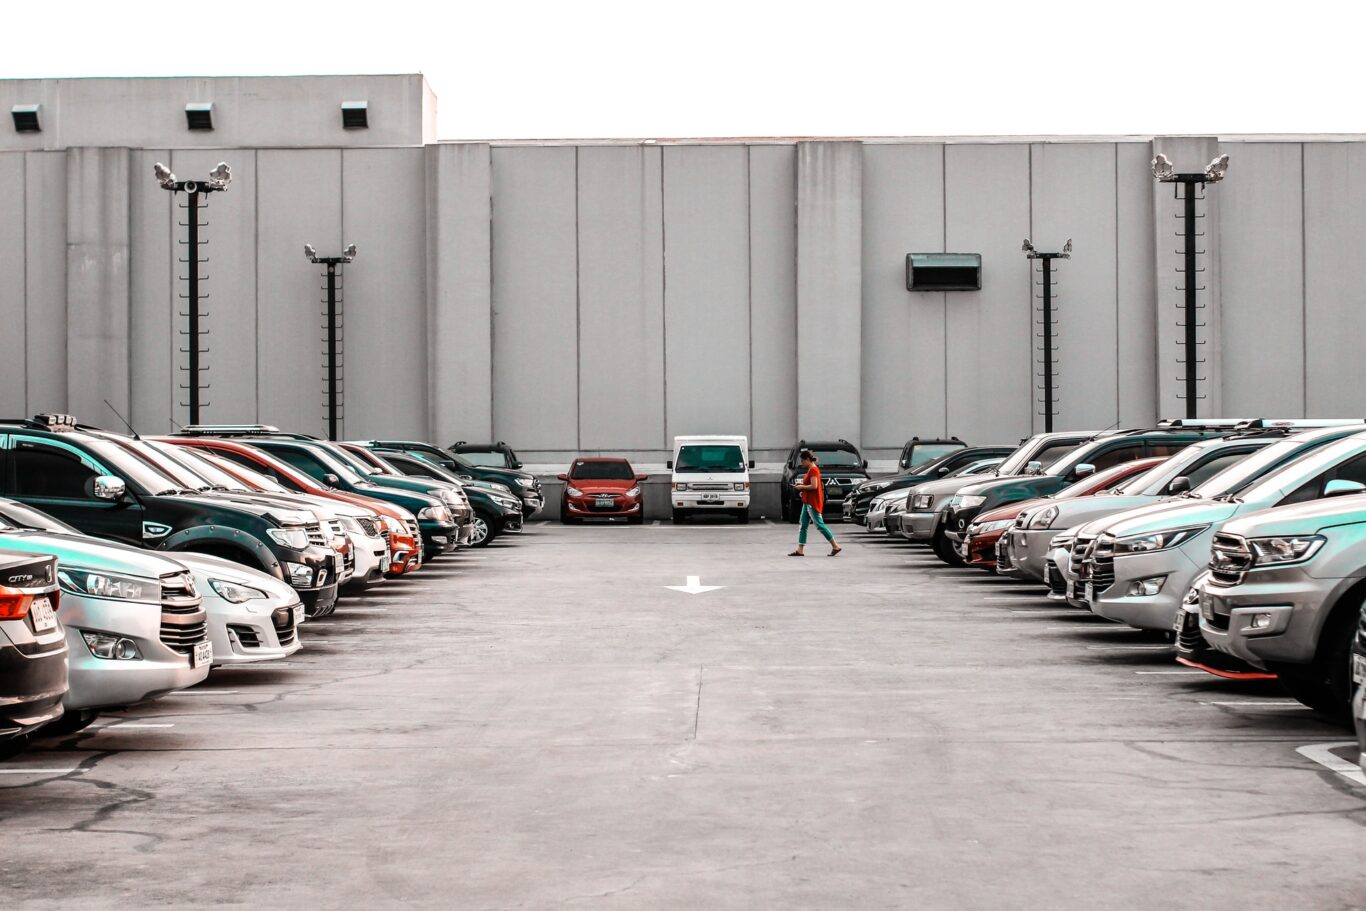 Parking στο χώρο της δεξίωσης